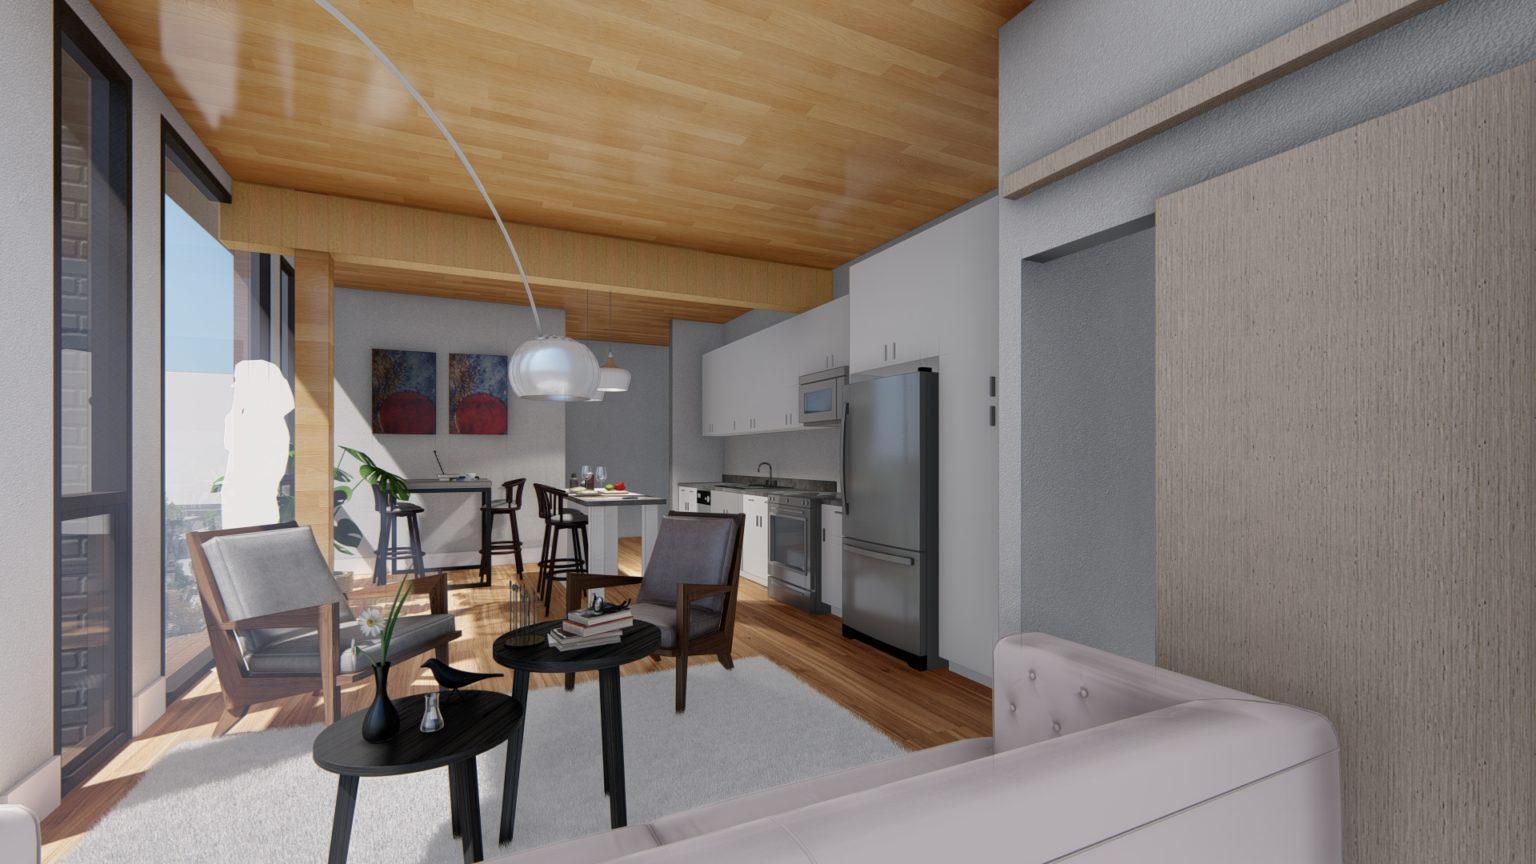 interiors_2 - Photo